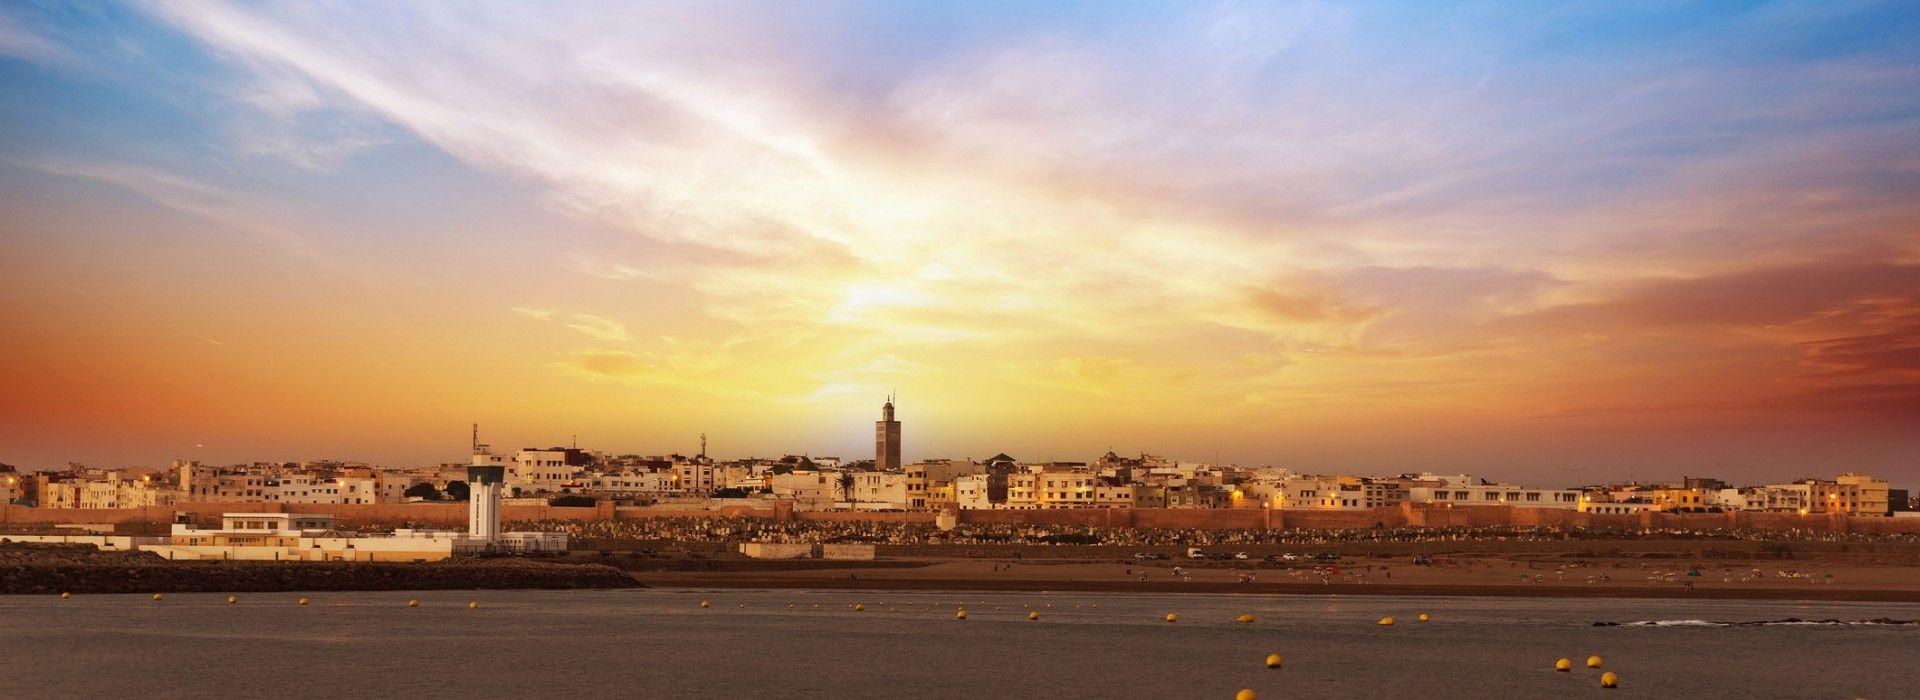 Adventure Tours in Marrakech